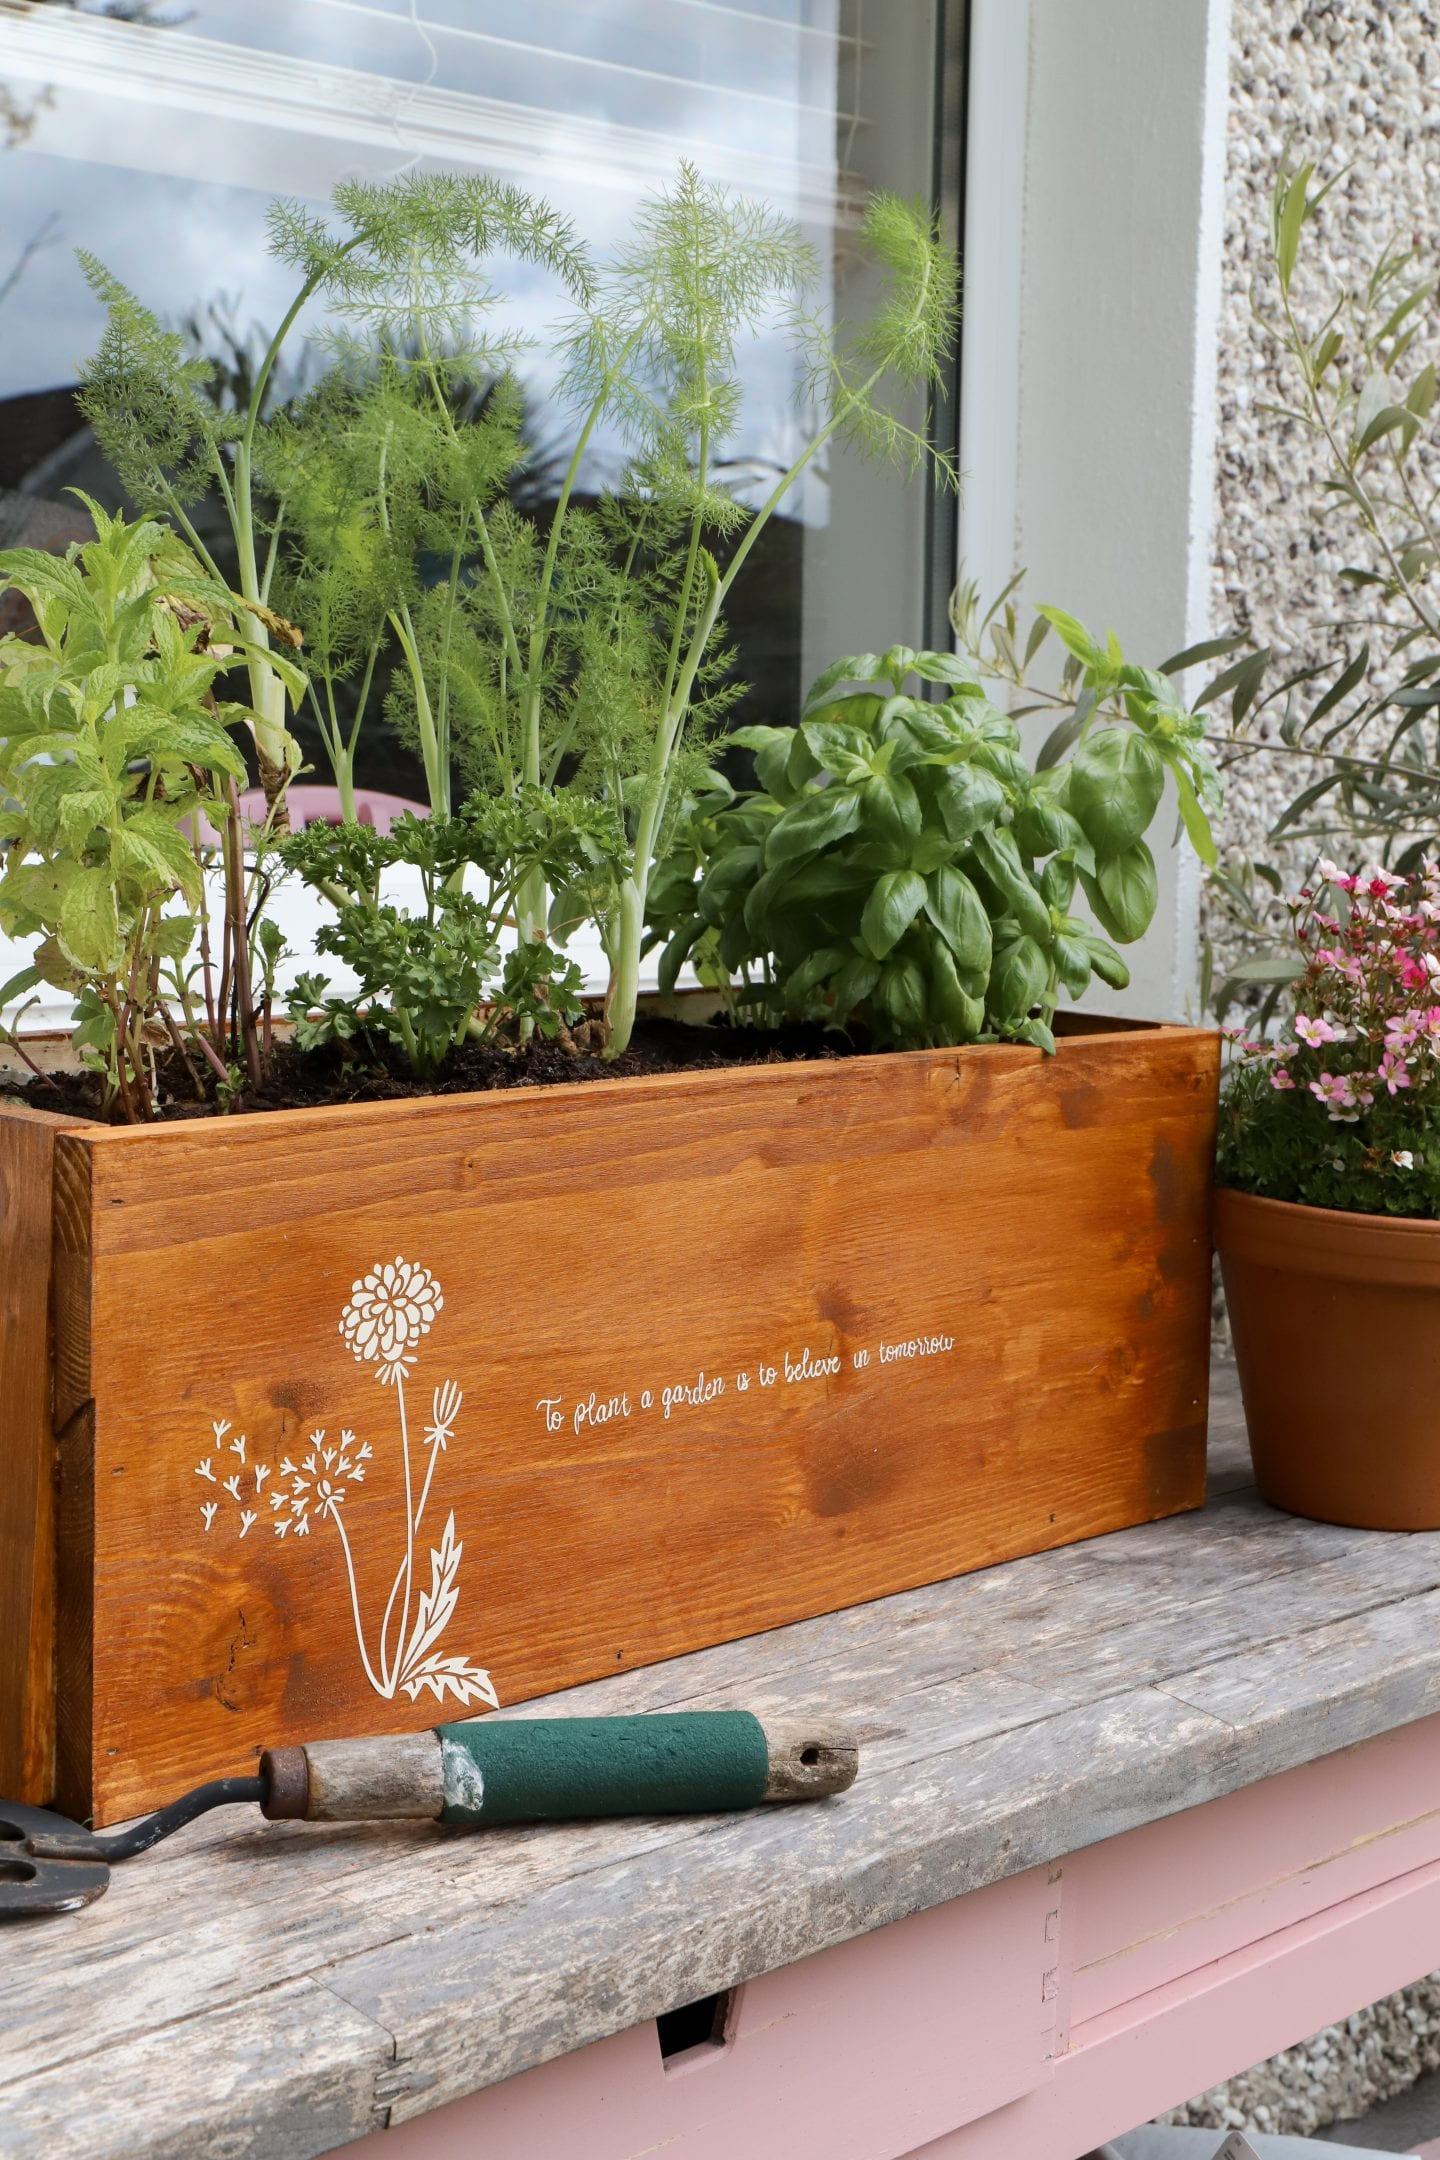 Personalised planter box